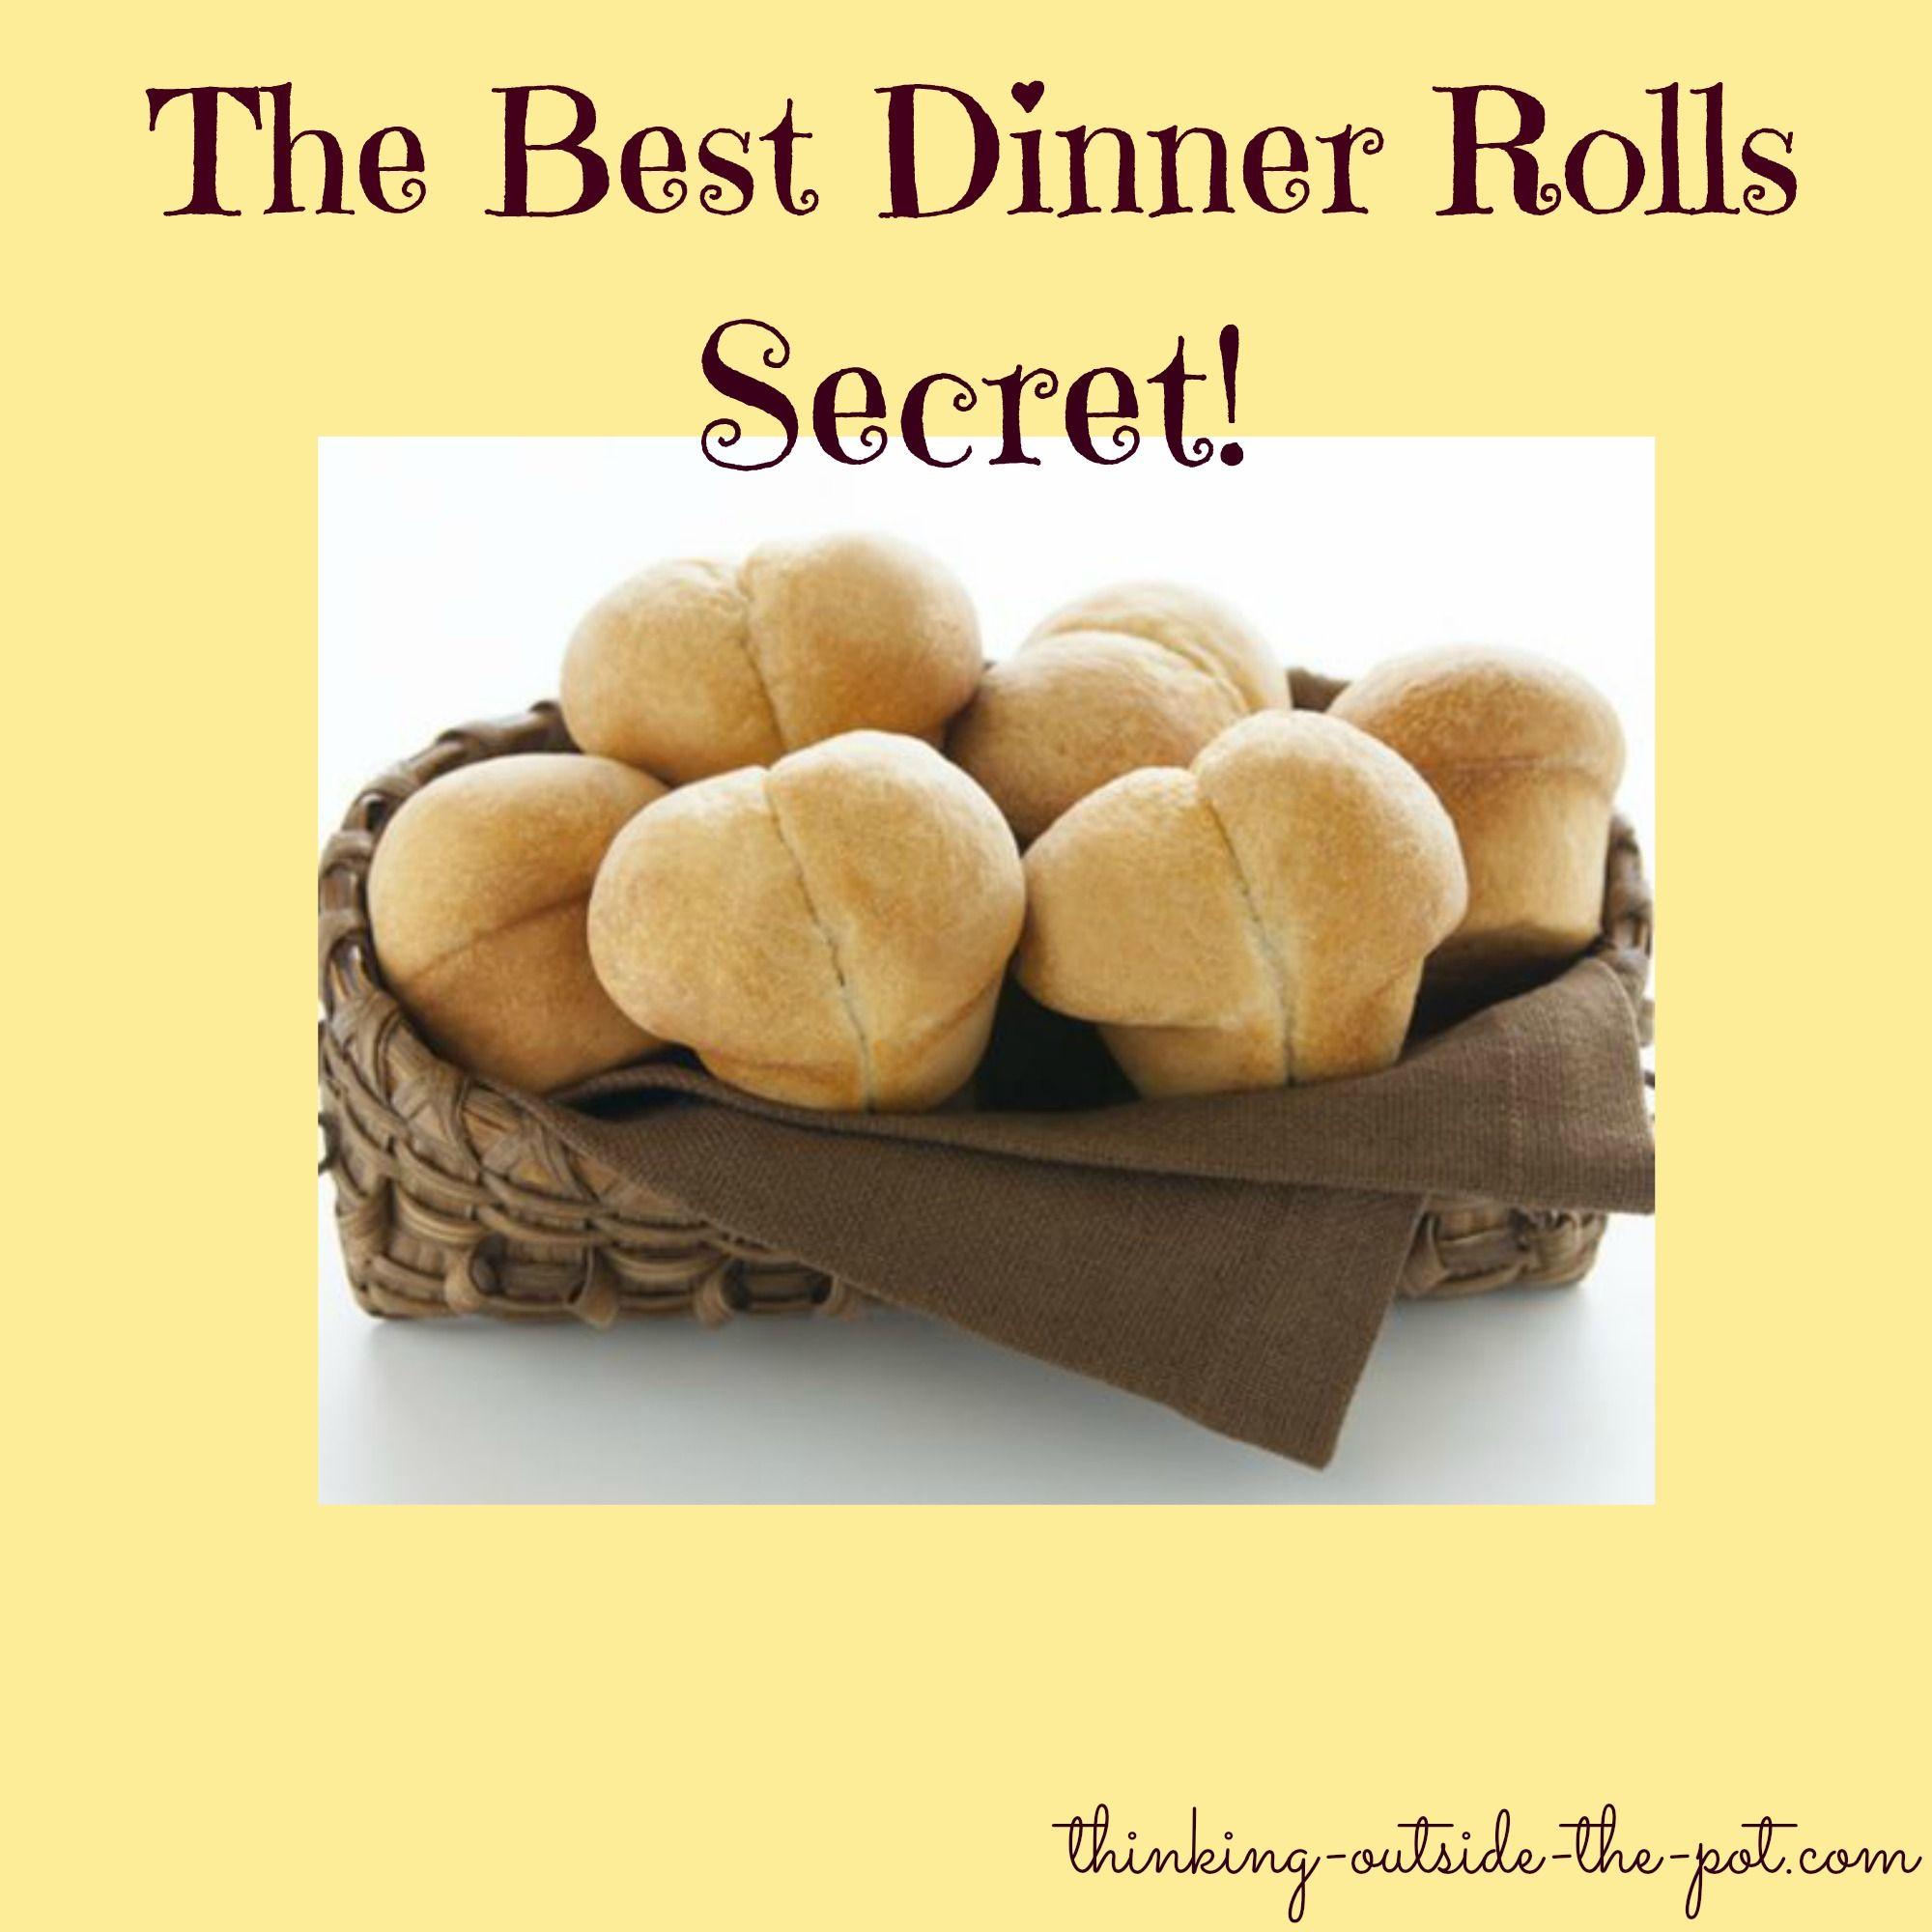 The Best Dinner Rolls Secret Food Recipes Frozen Dinner Rolls